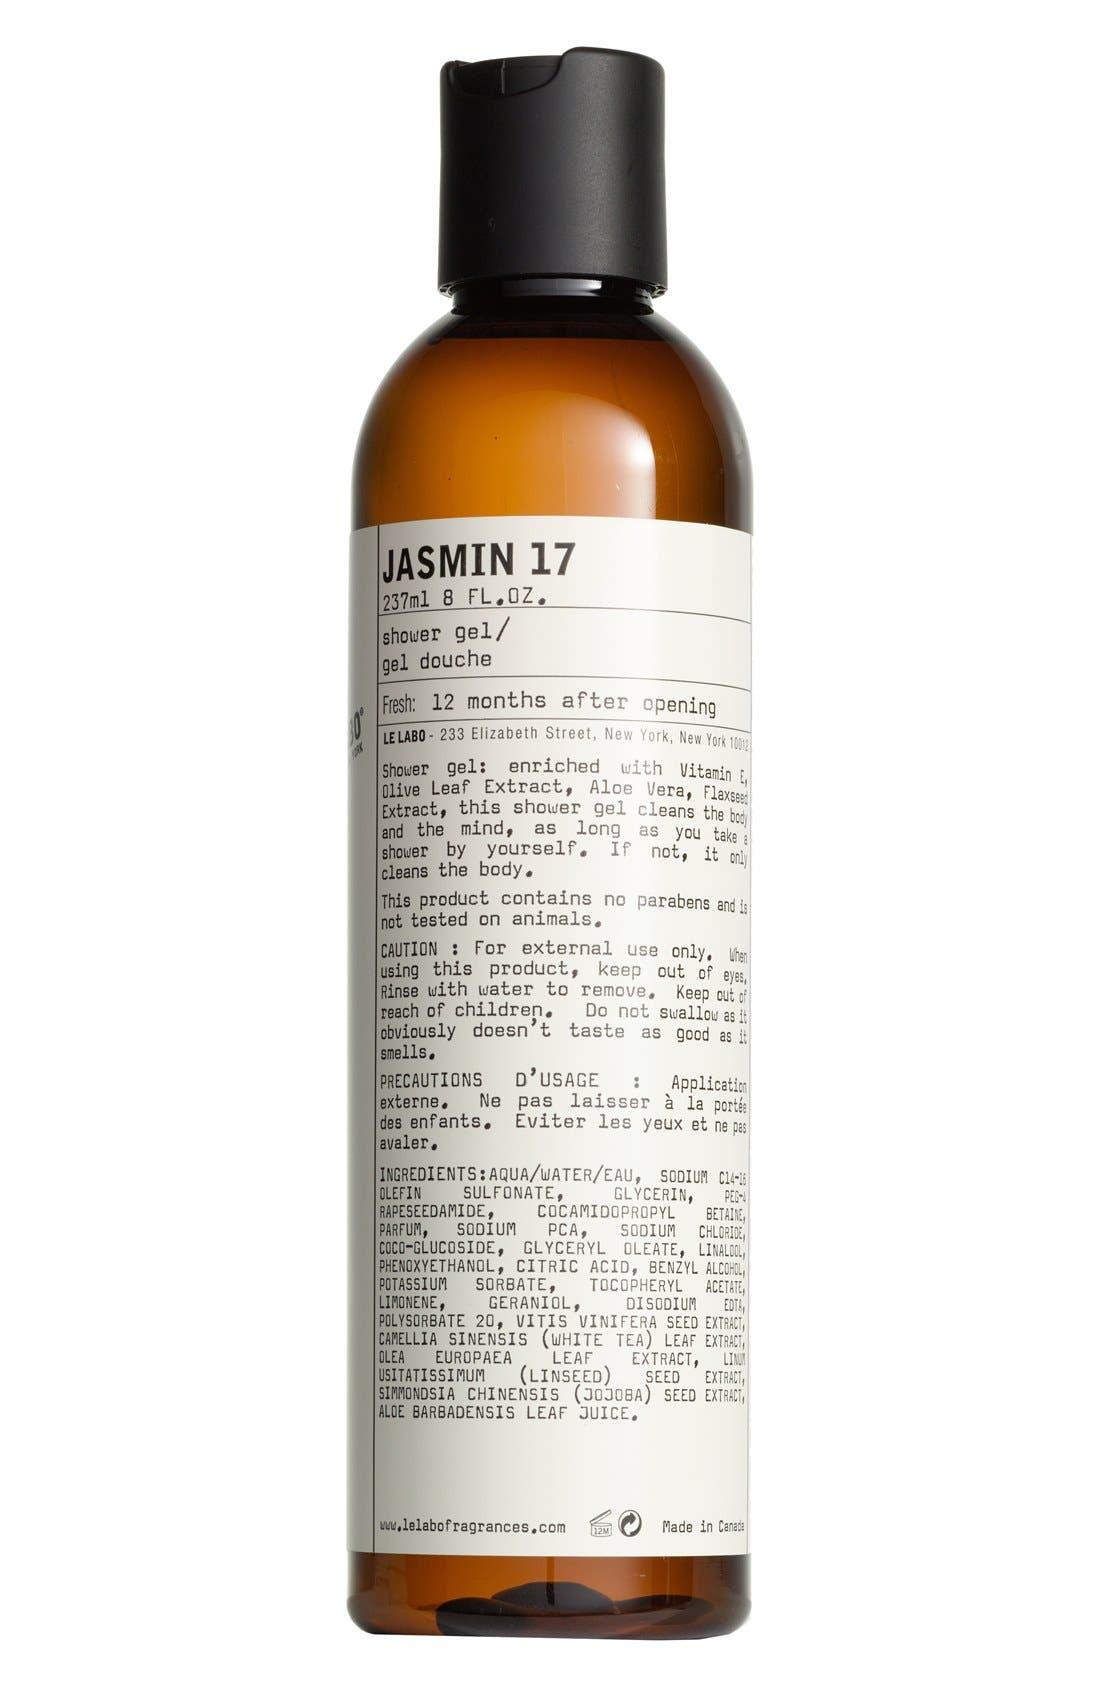 Jasmin 17 Shower Gel